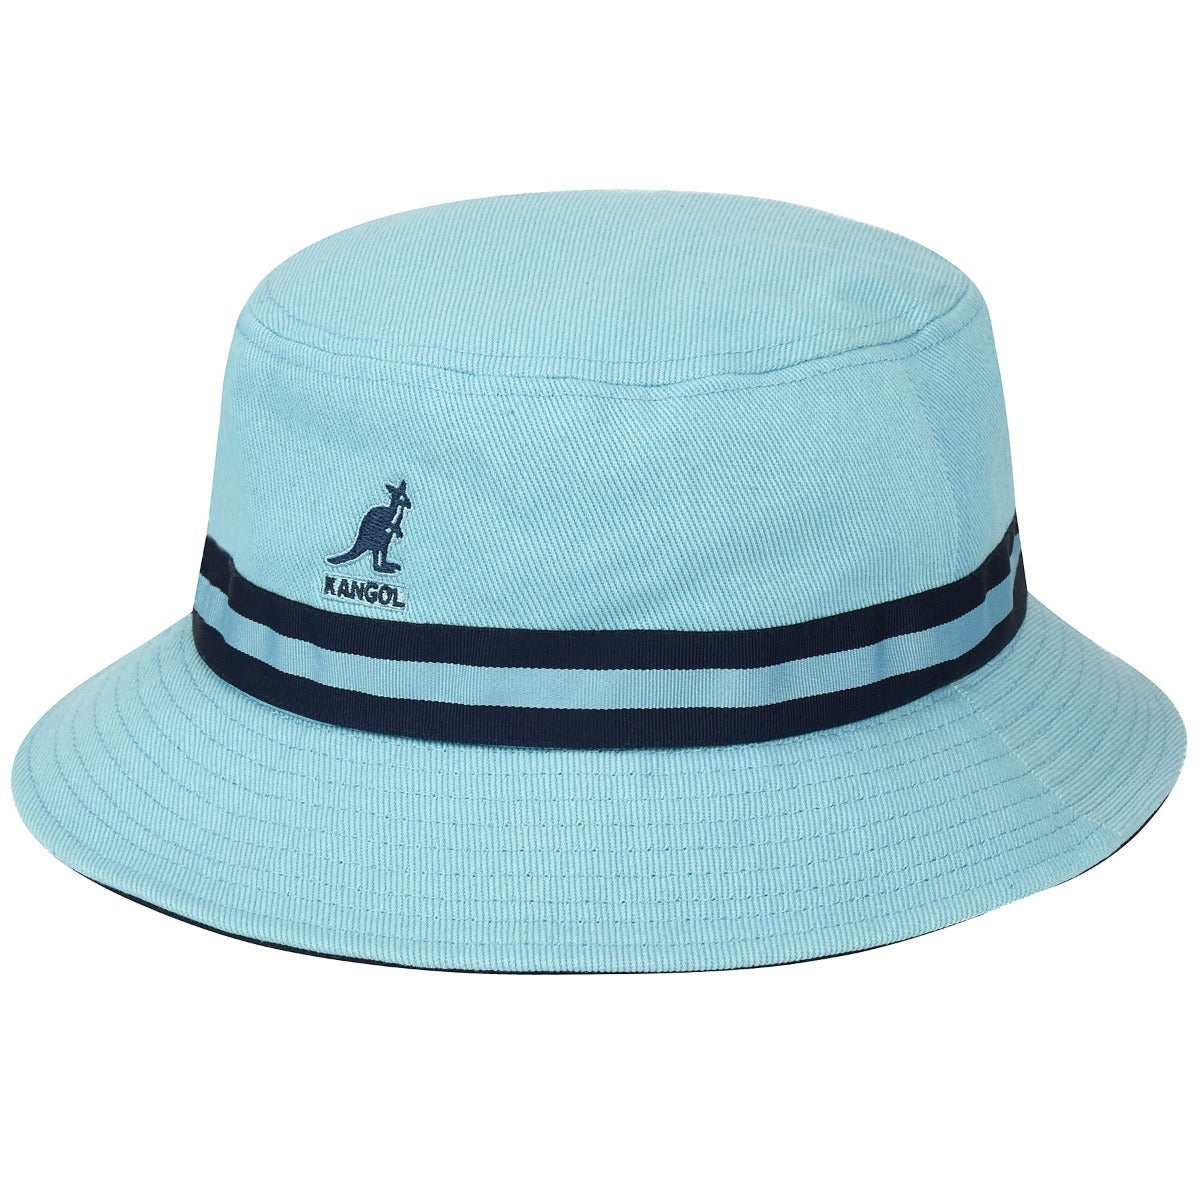 Kangol Mens Stripe Bucket Hat Cotton